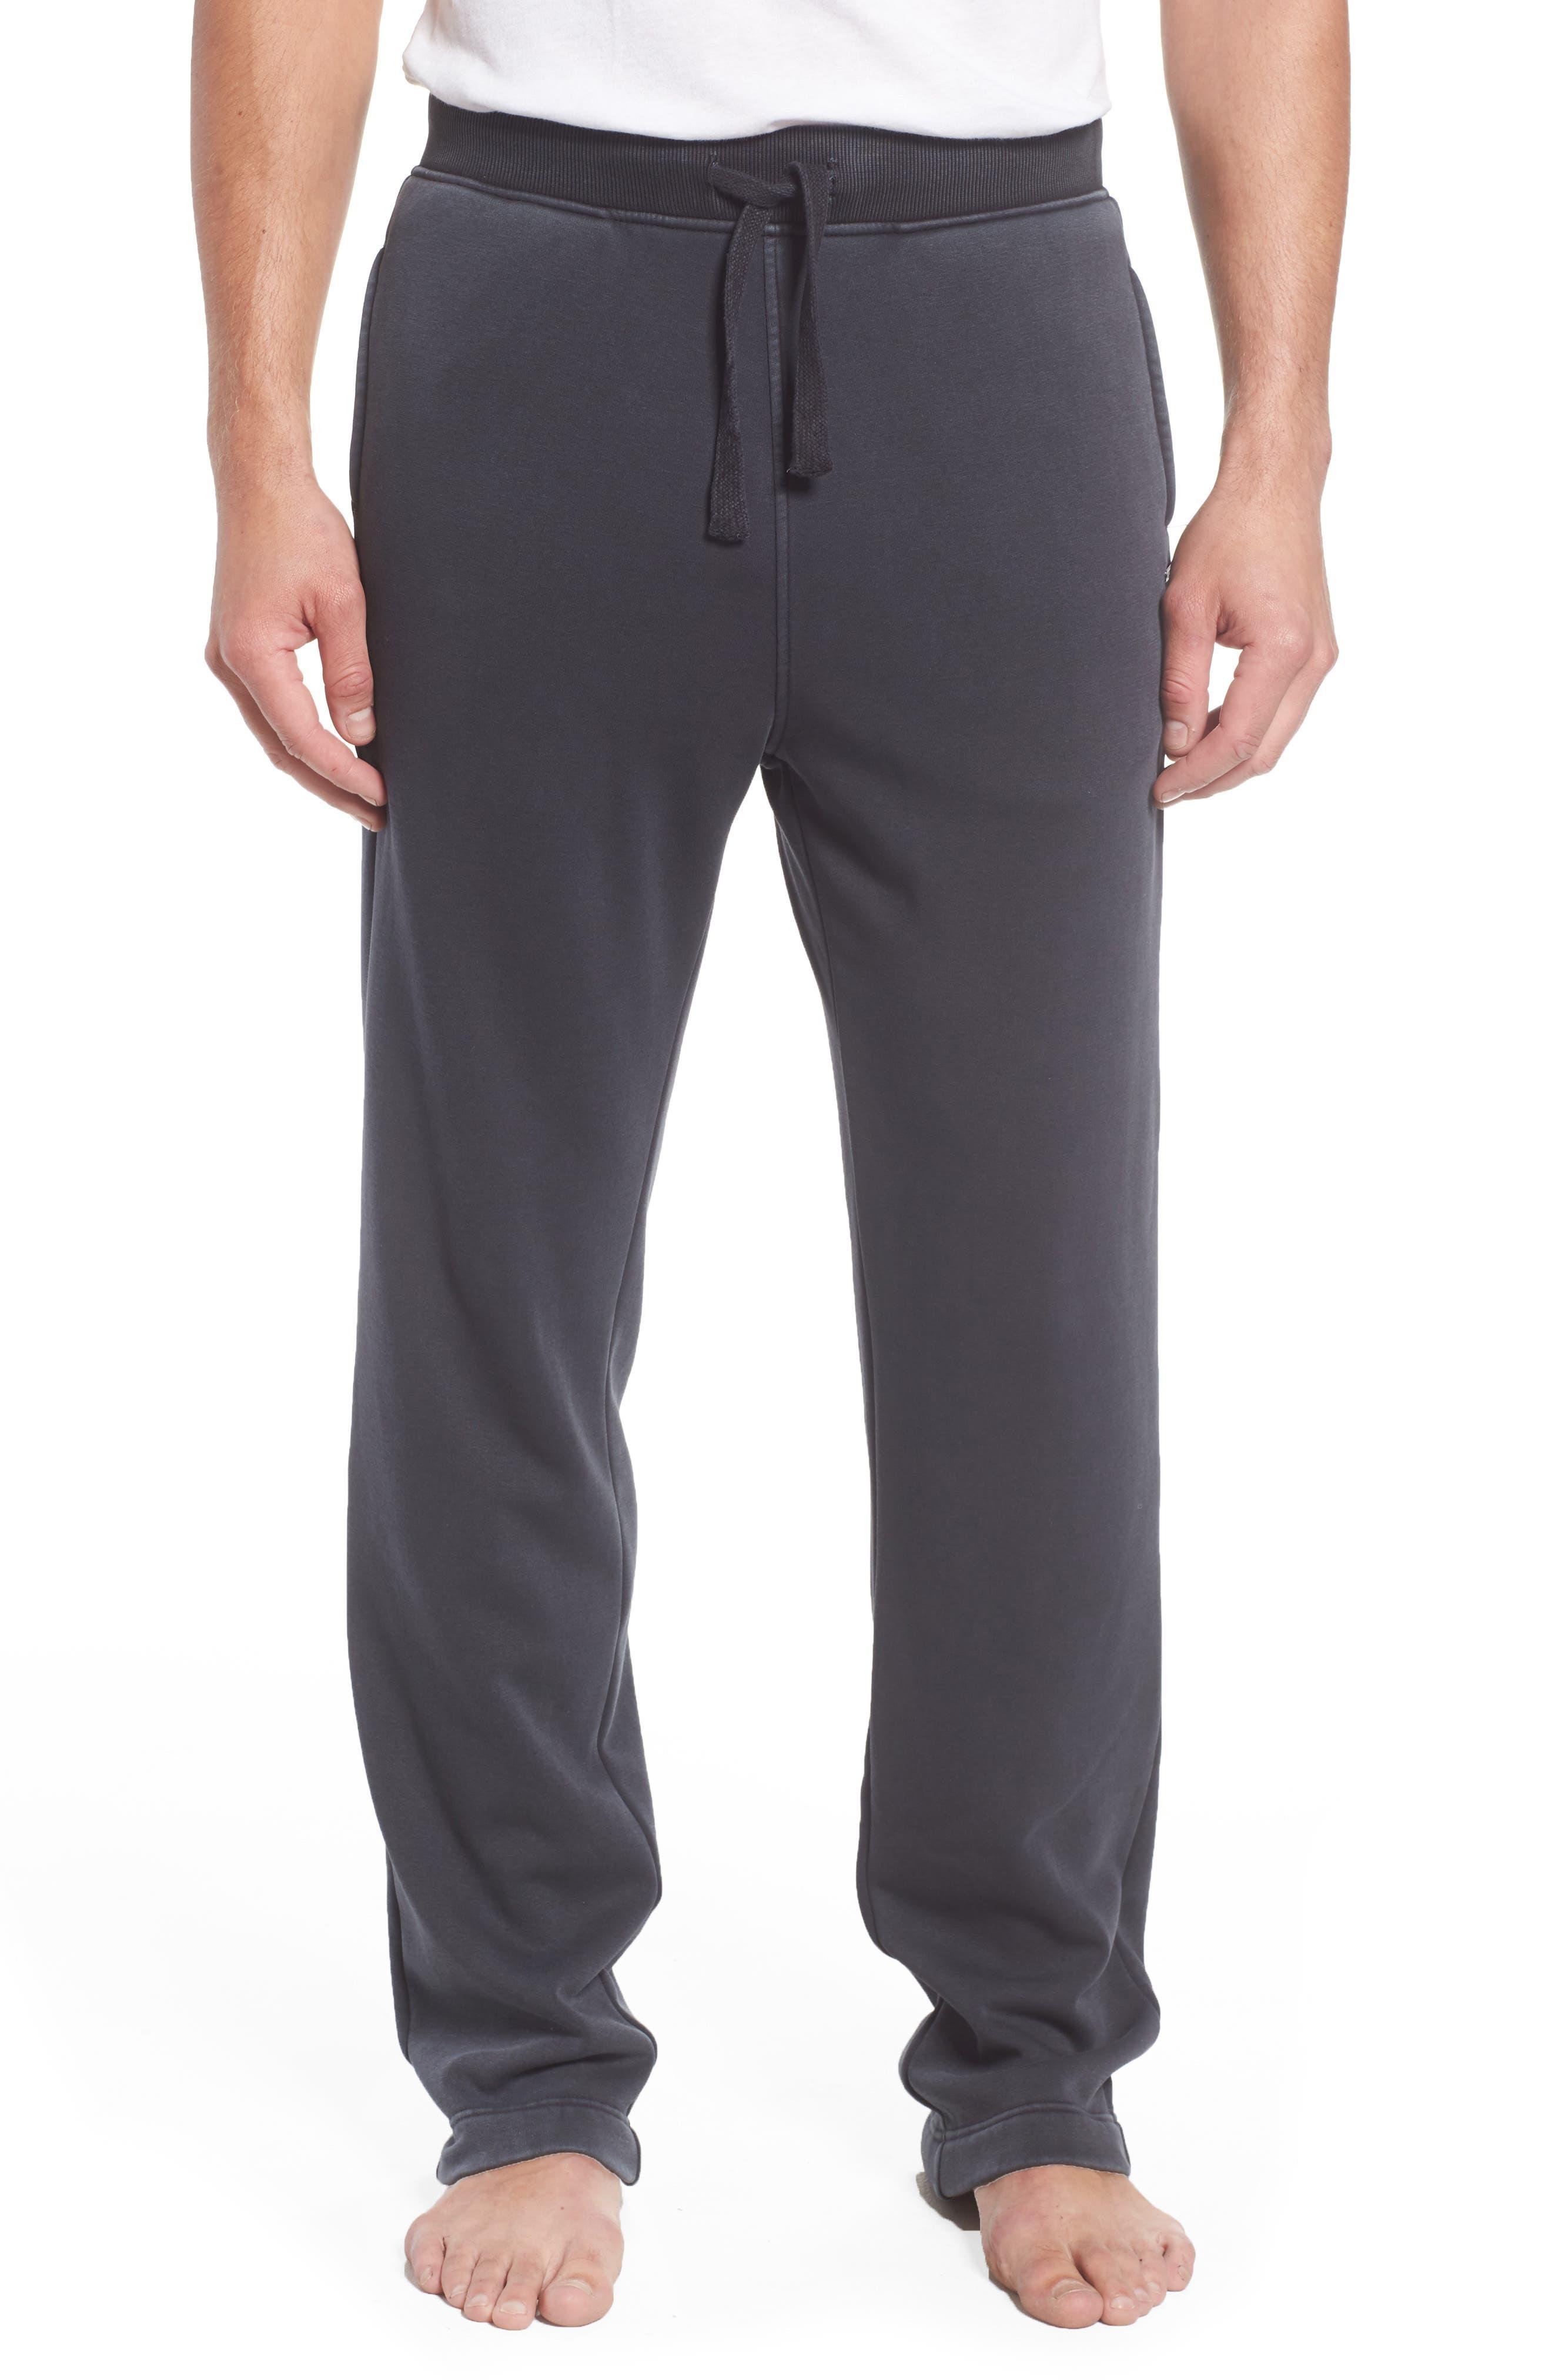 UGG<SUP>®</SUP>, Wyatt Stretch Cotton Lounge Pants, Main thumbnail 1, color, CHARCOAL